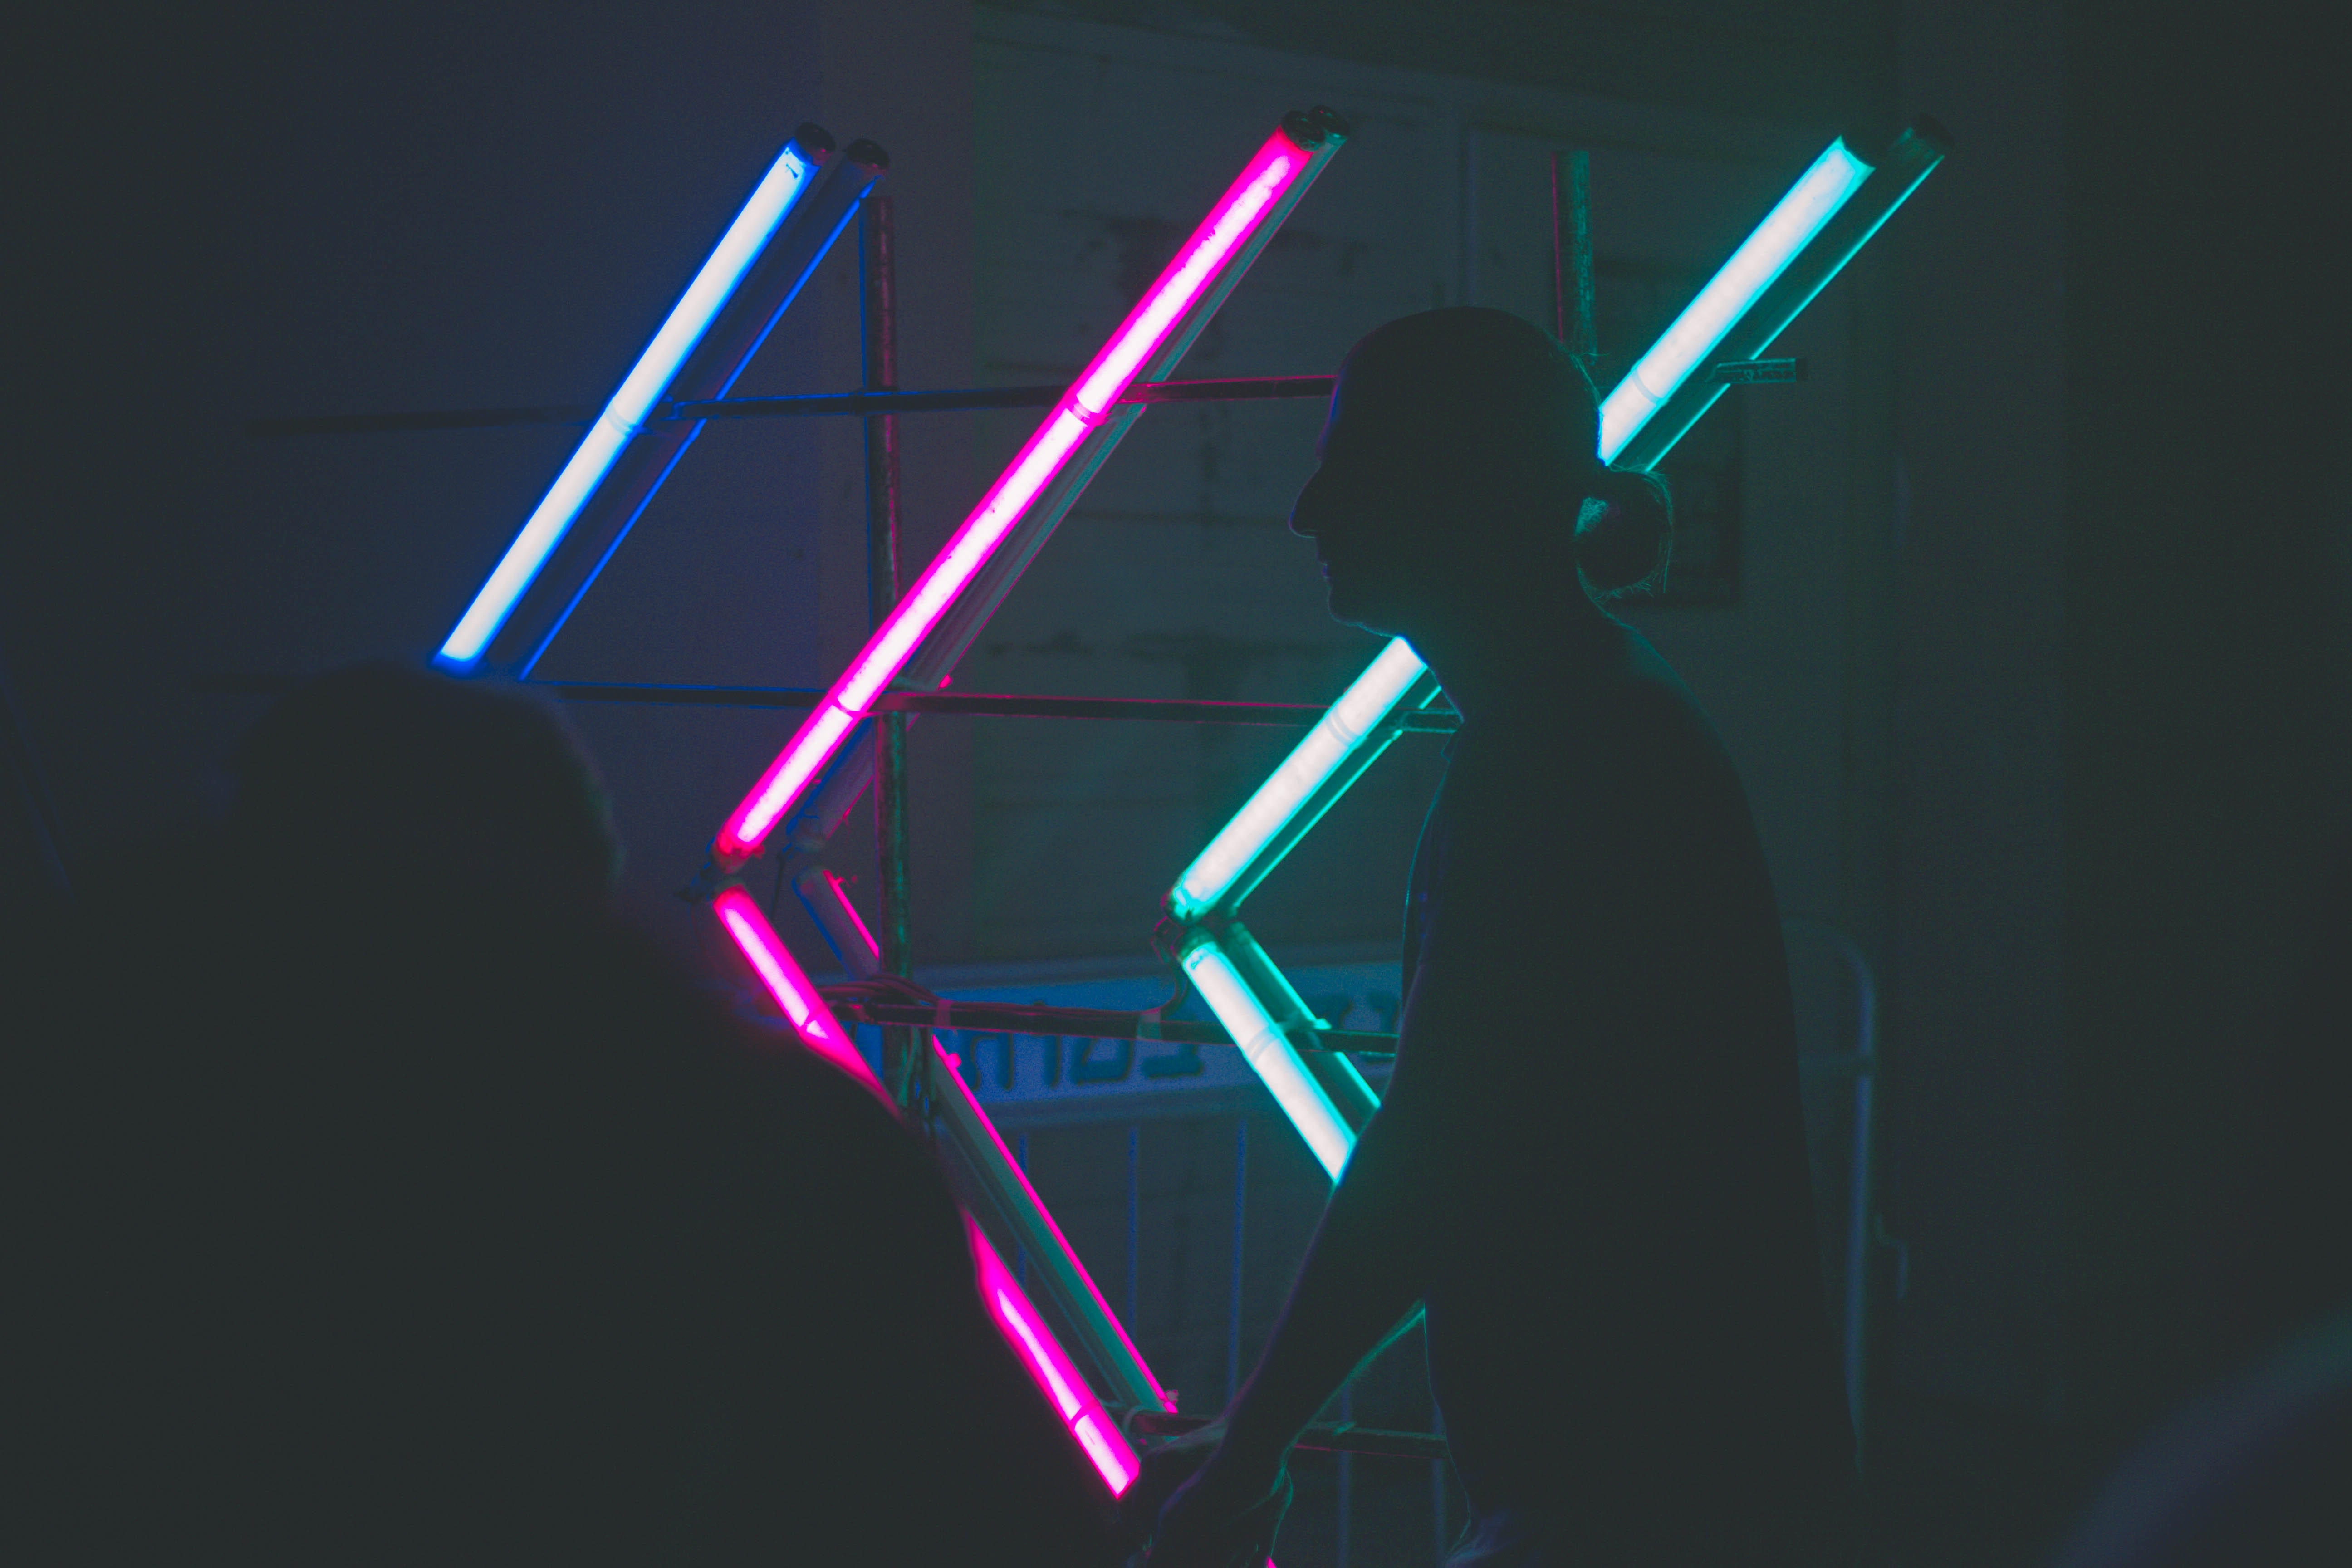 silhouette of man near neon lights